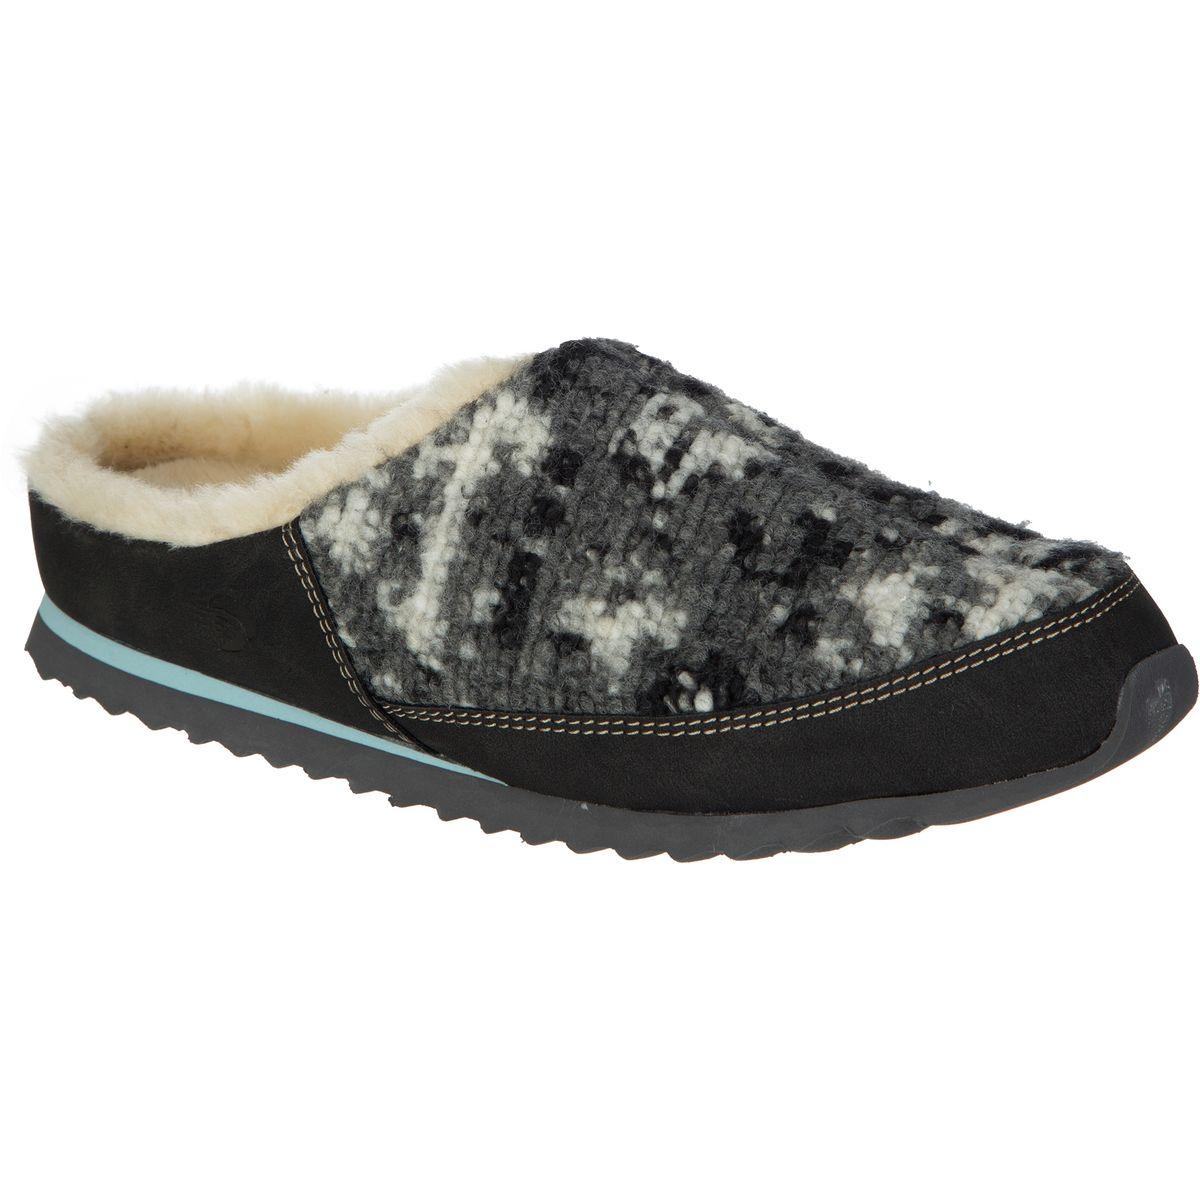 Acorn Sneaker Scuff Slipper - Women's